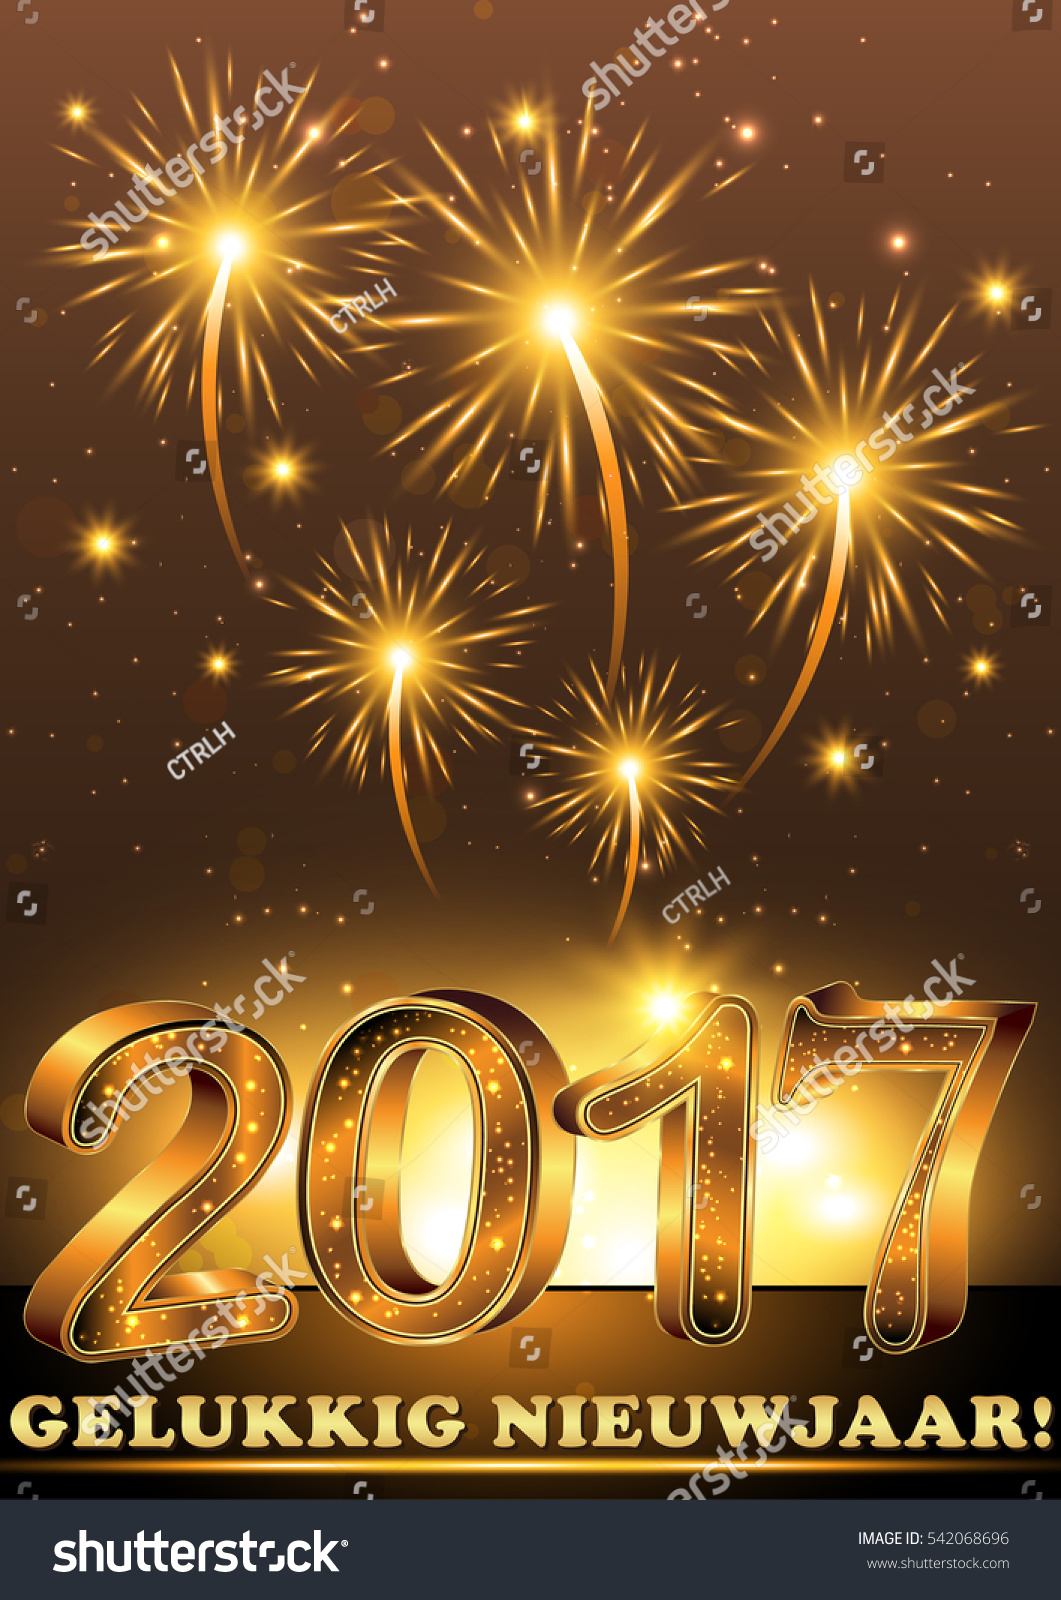 happy new year 2017 gelukkig nieuwjaar dutch greeting card background